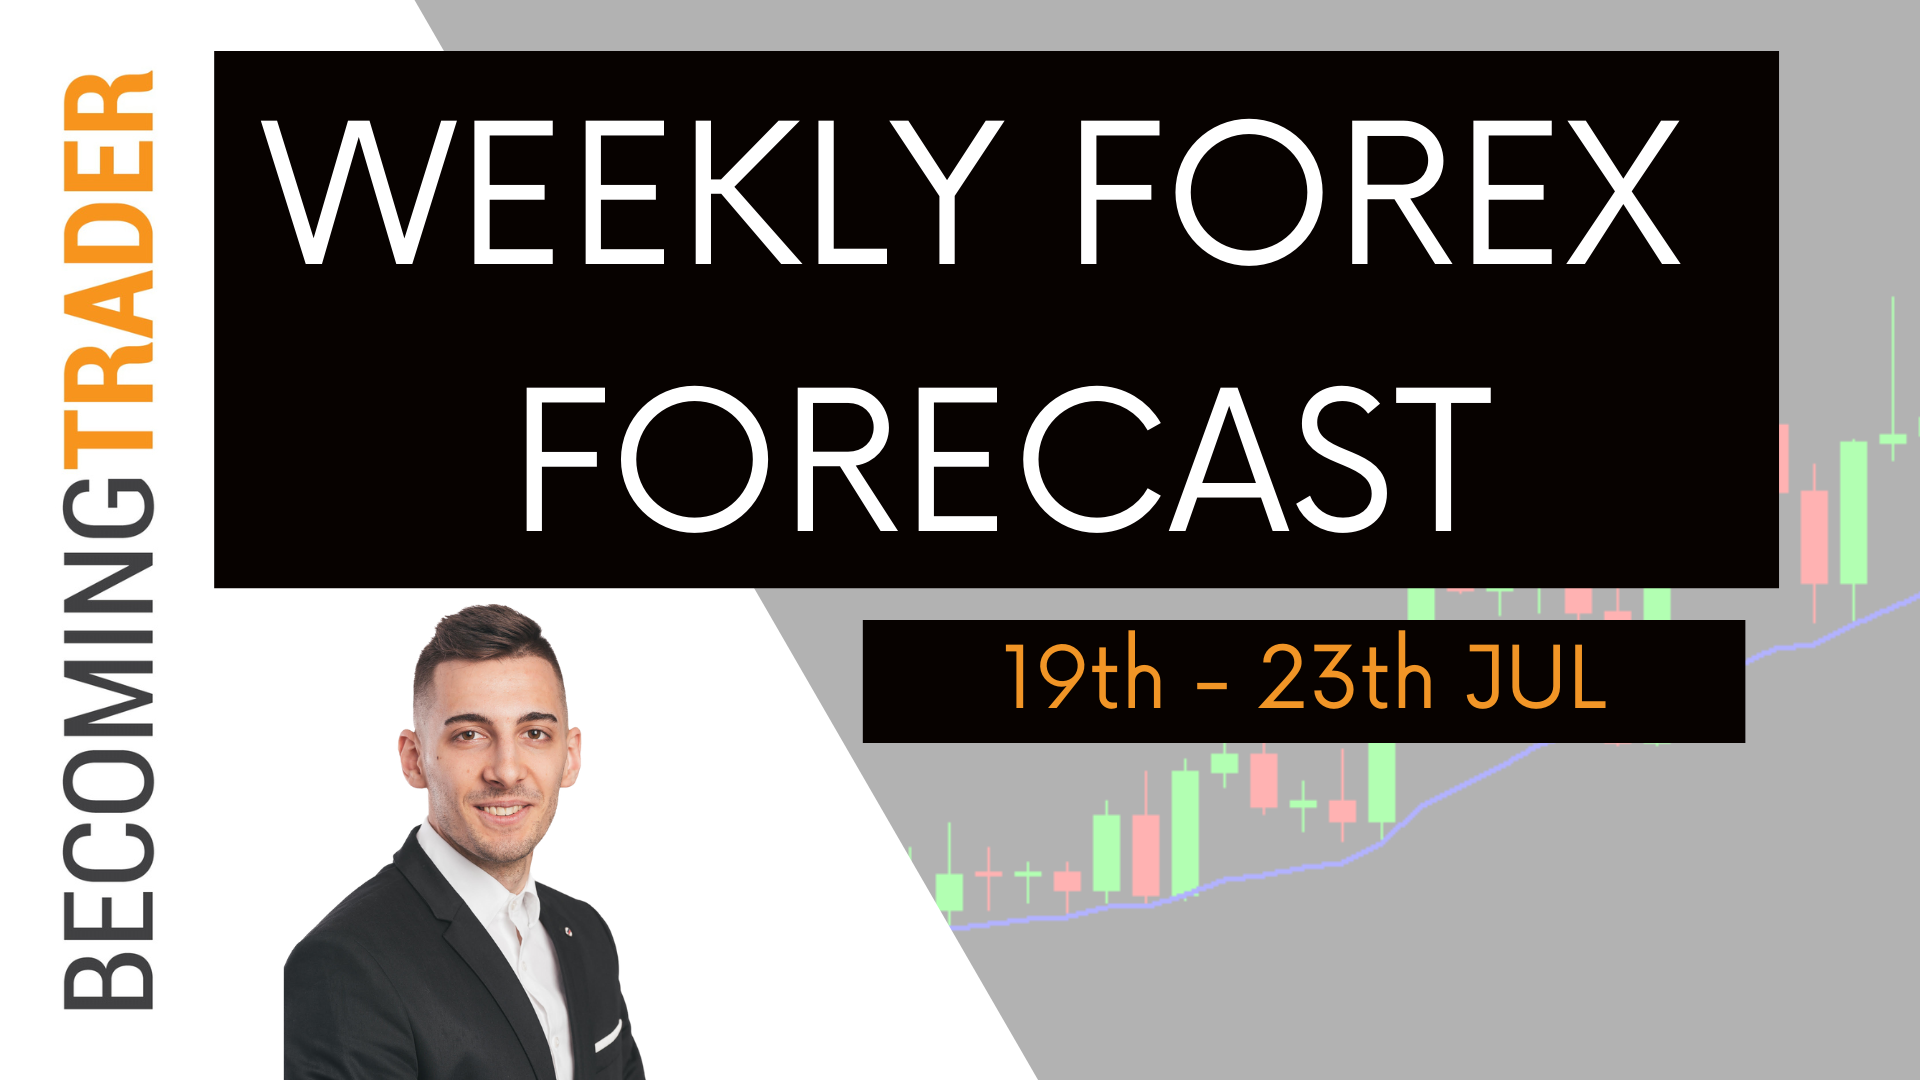 Weekly Forex Forecast 19th to 23rd July 2021 | EURUSD , GBPUSD , AUDUSD , NZDUSD , USDCAD , USDJPY